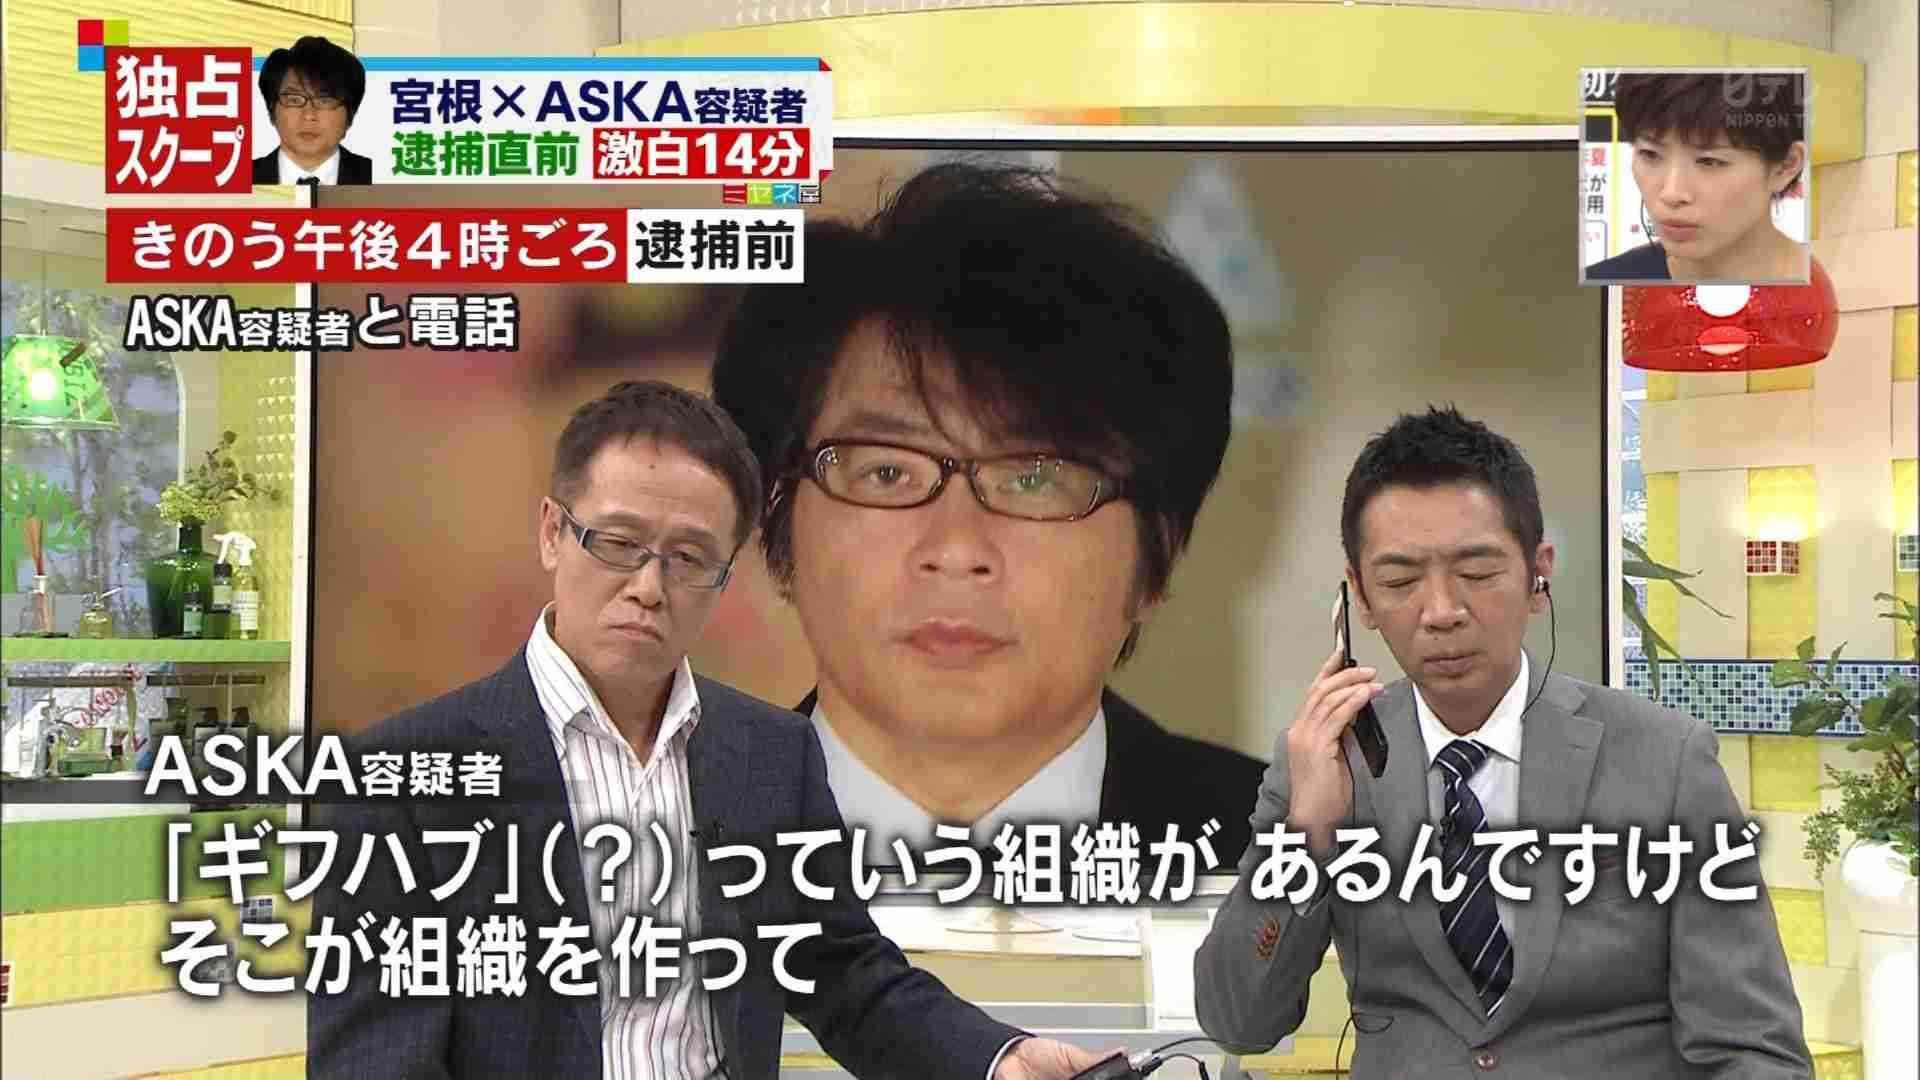 ASKA生出演でテレビ復帰 15日夕、地元福岡の番組で新曲も披露